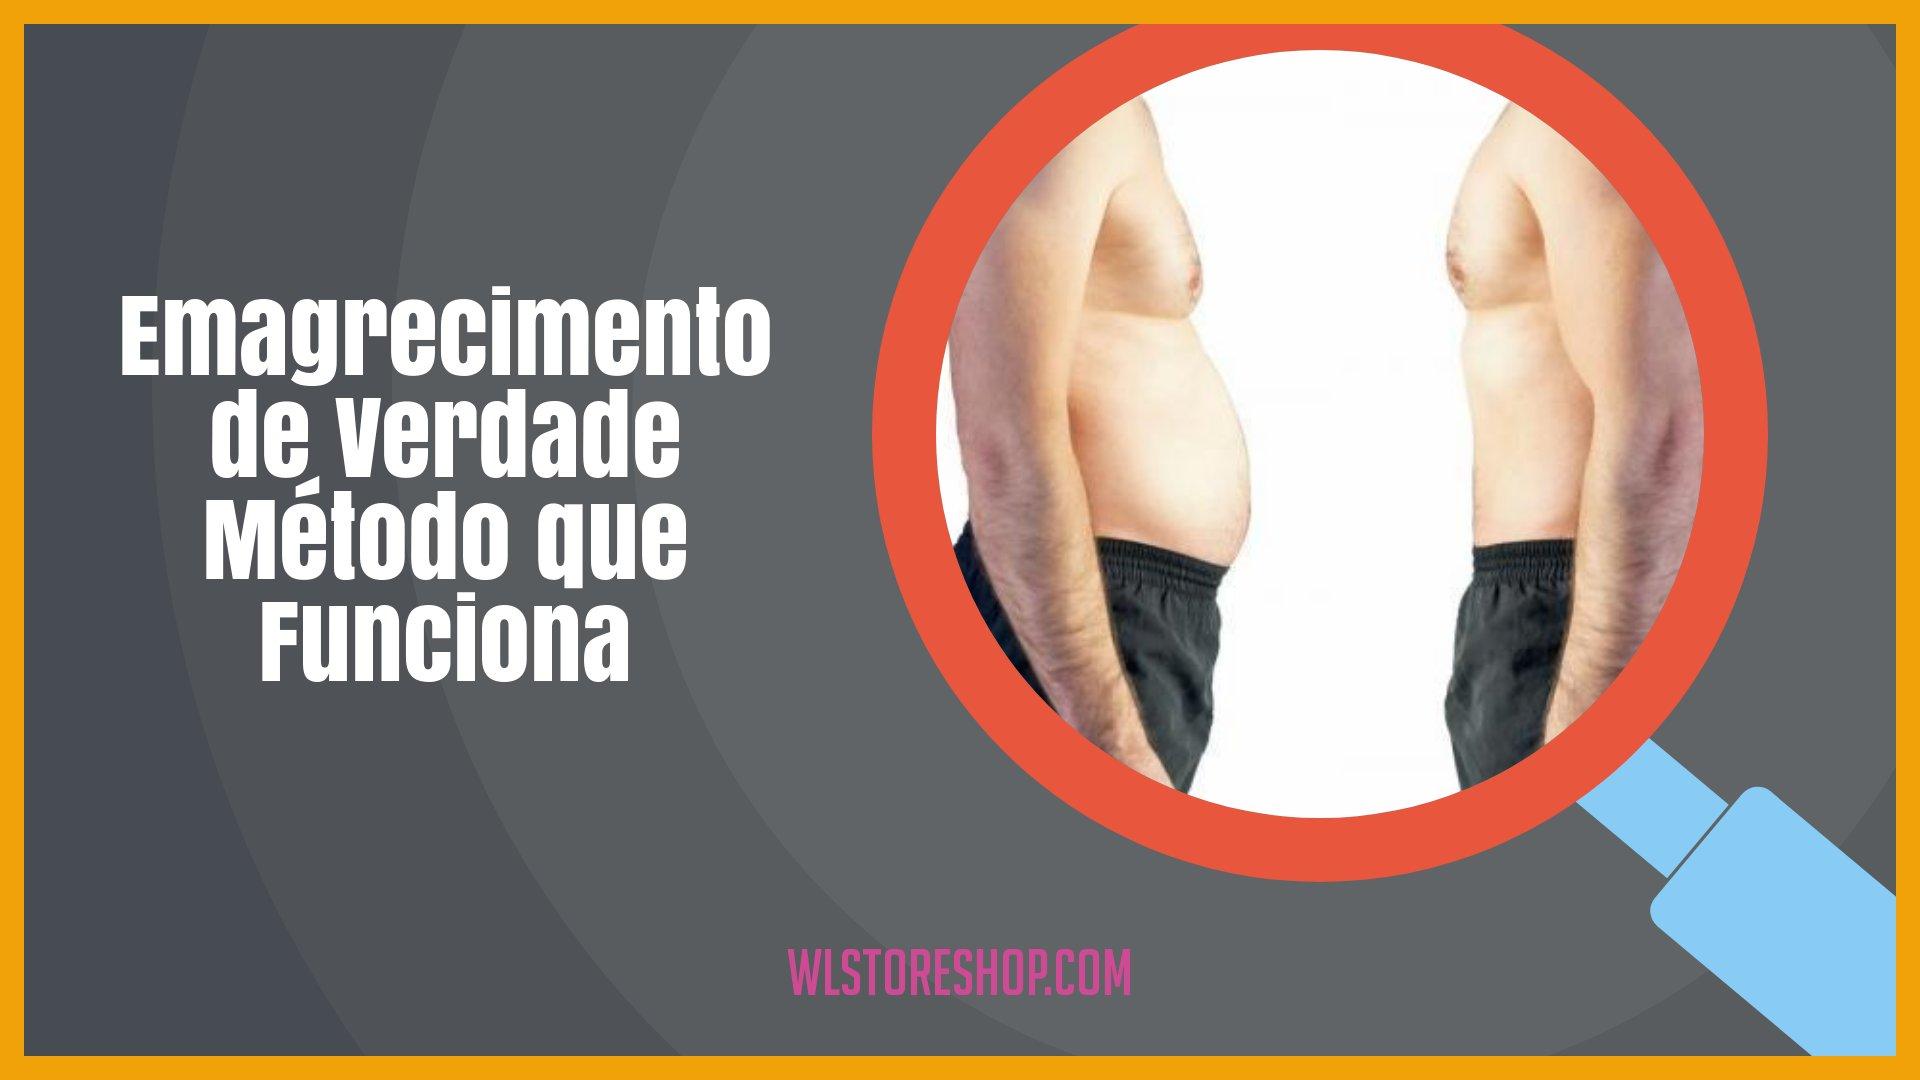 Bajar de peso en una semana de manera natural